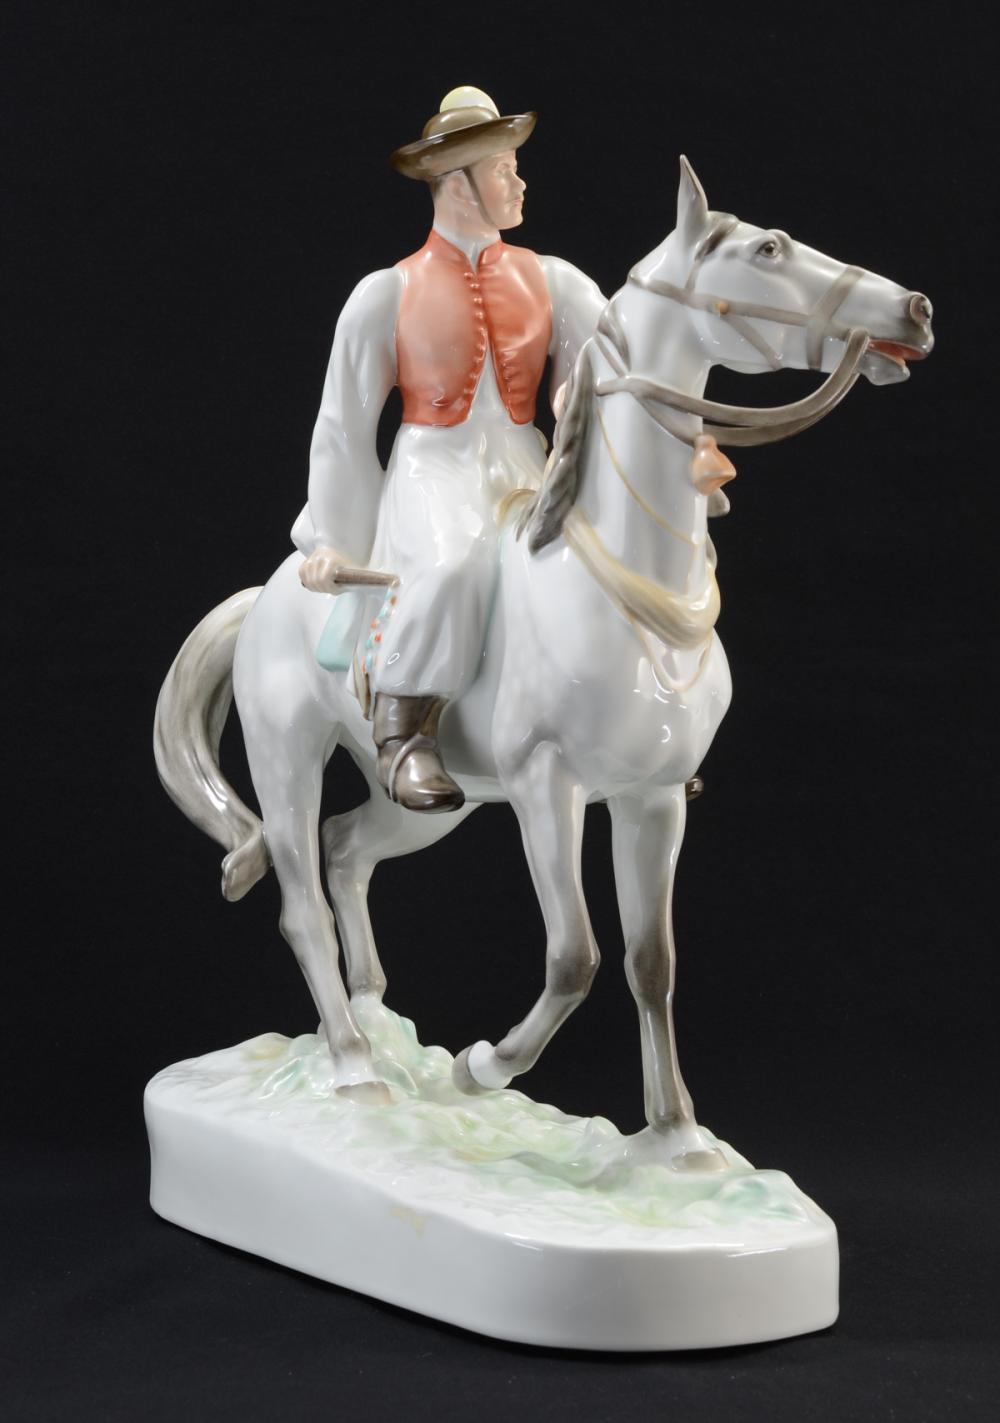 Herend Porcelain Figurine: Man on Horse